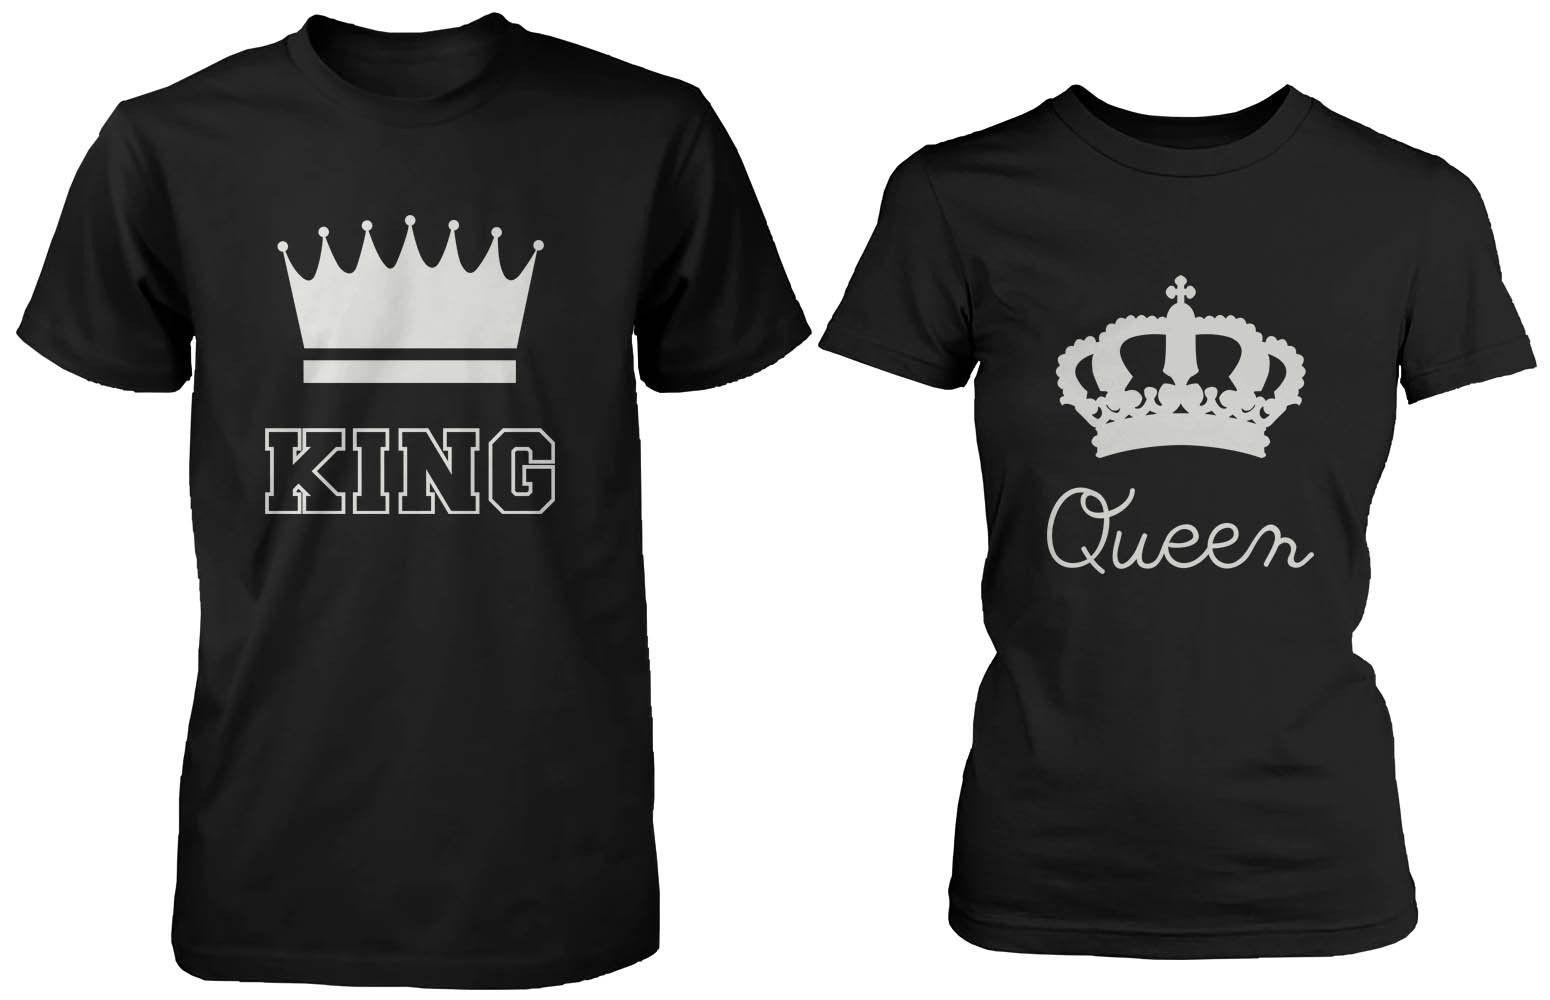 49cbeff05 Cute Matching Couple Shirts King and Queen Black Cotton T-shirt Set ...